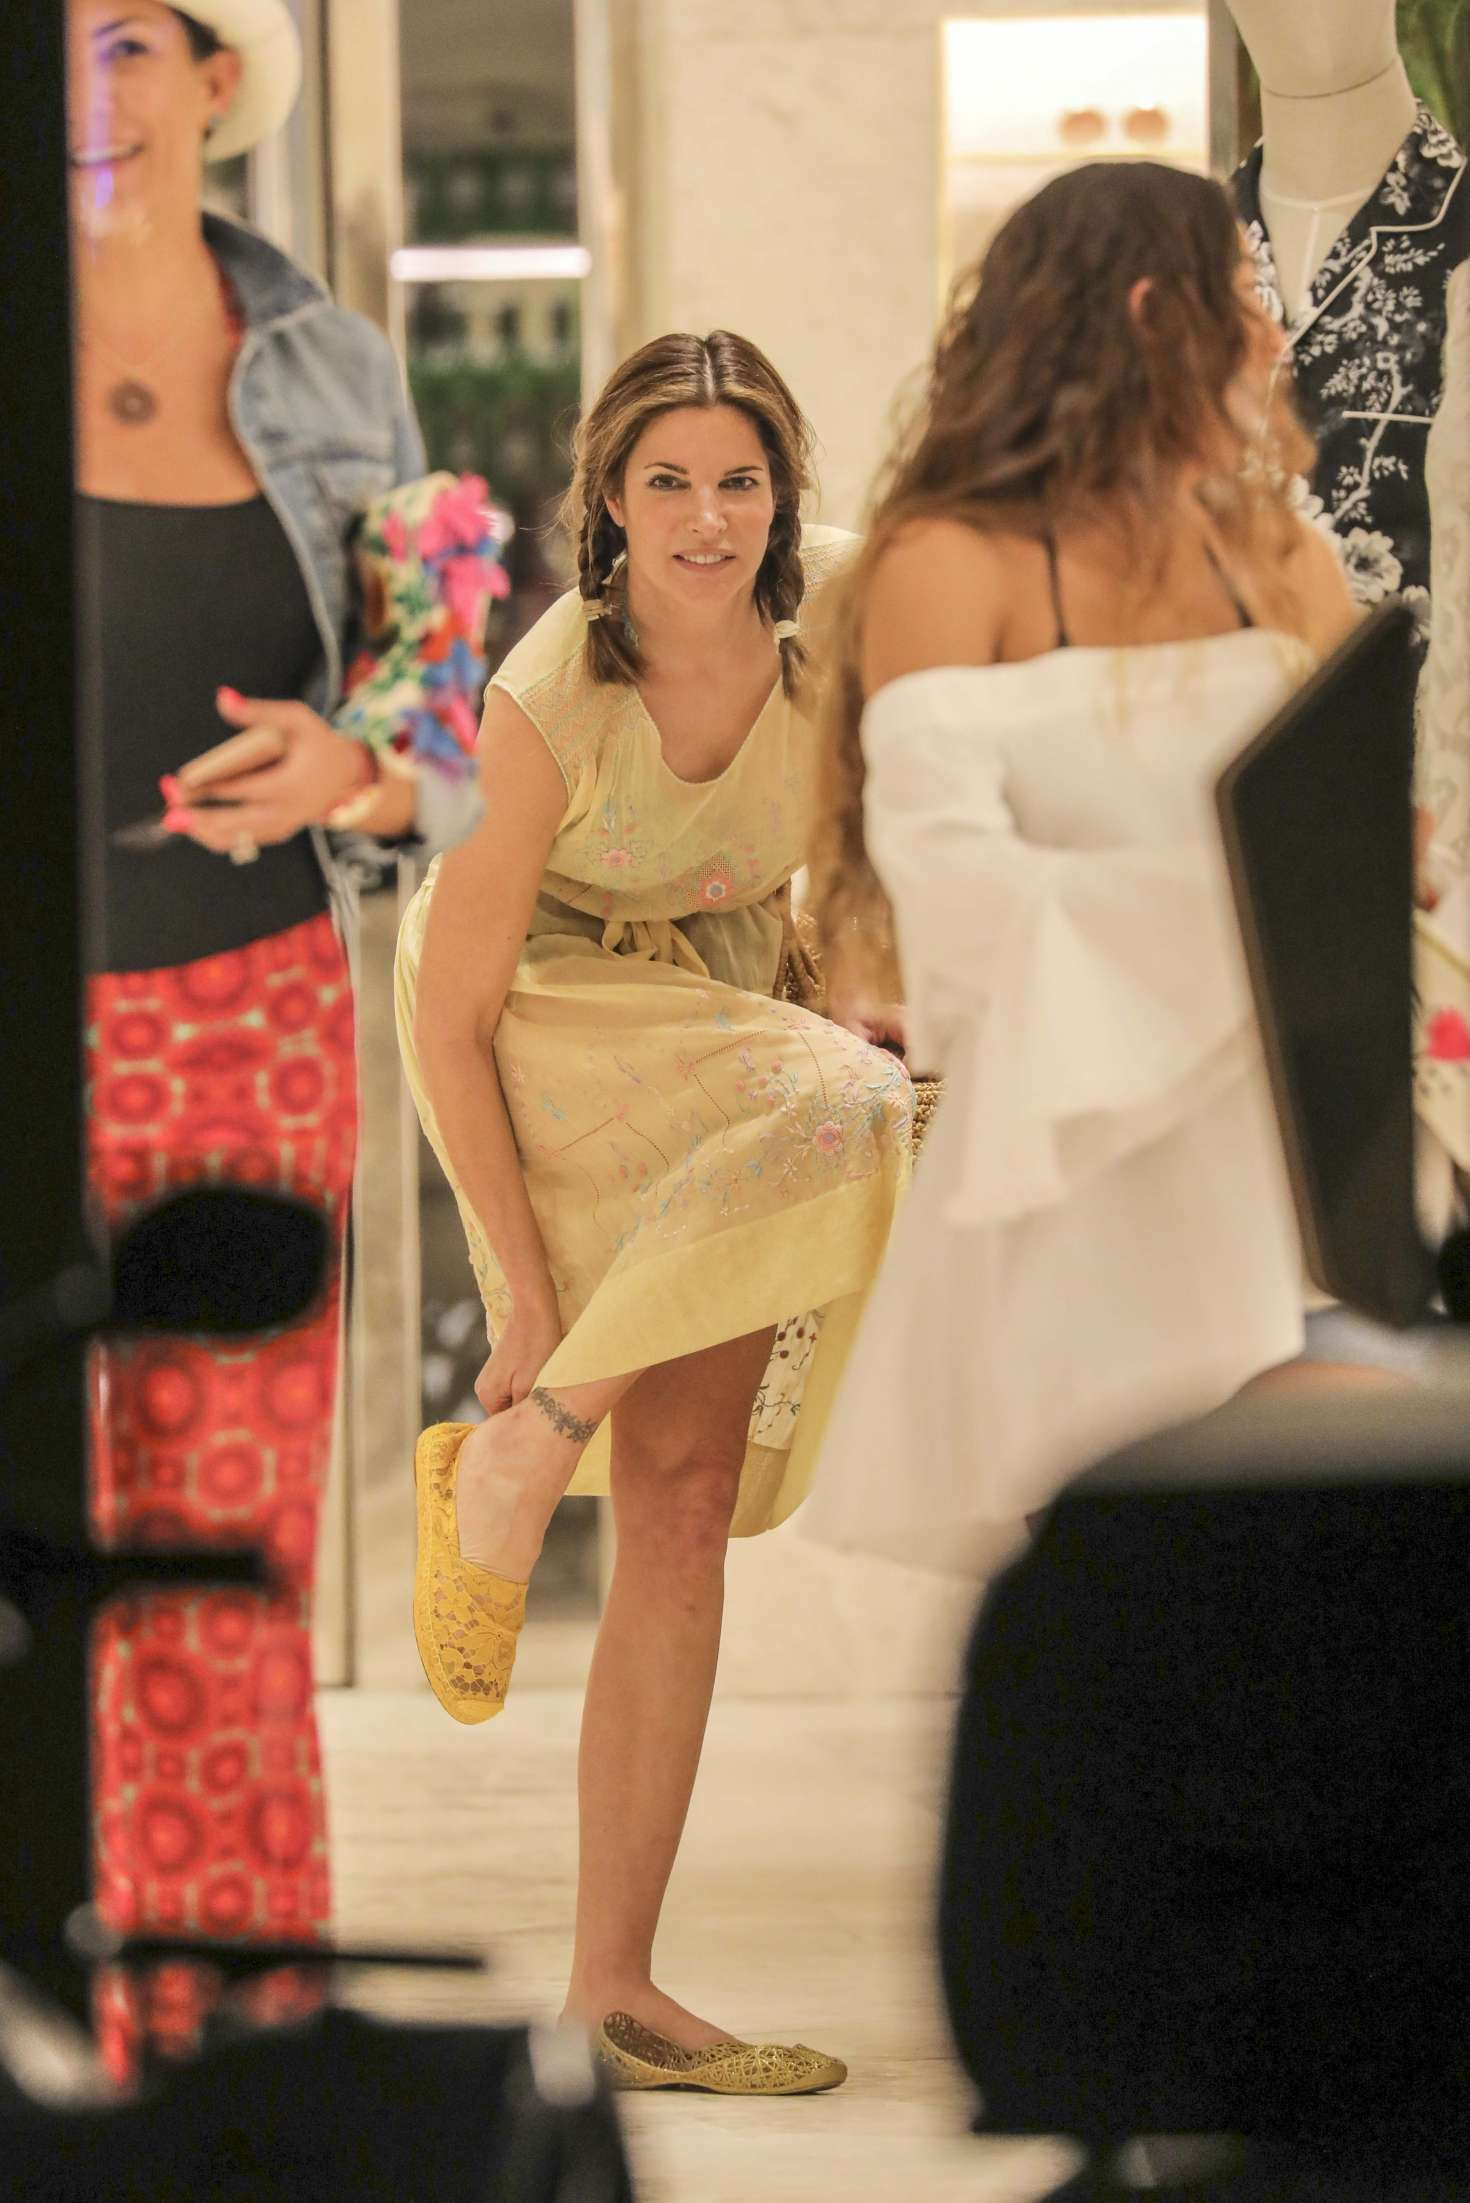 Stephanie Seymour 2016 : Stephanie Seymour: Shopping at Dolce & Gabbana Store -02